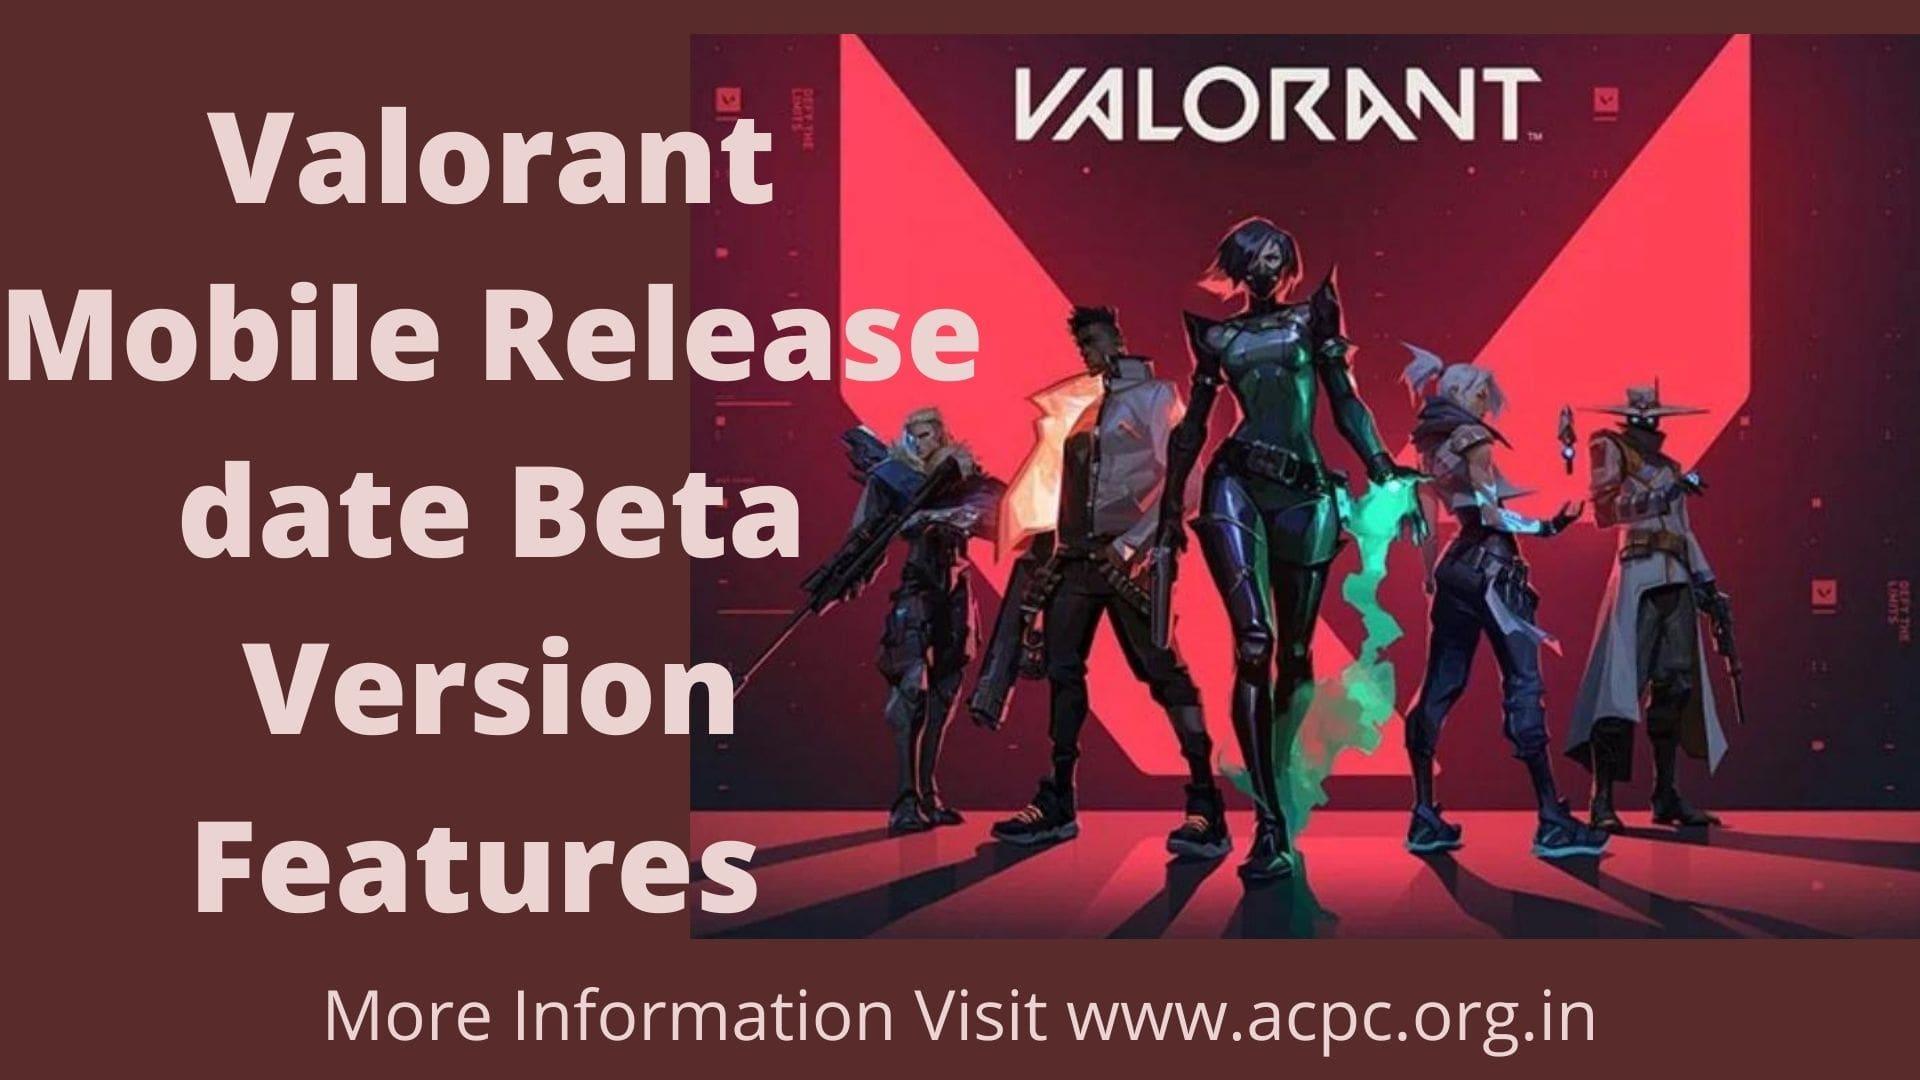 Valorant Mobile Release date   Beta Version   Features  